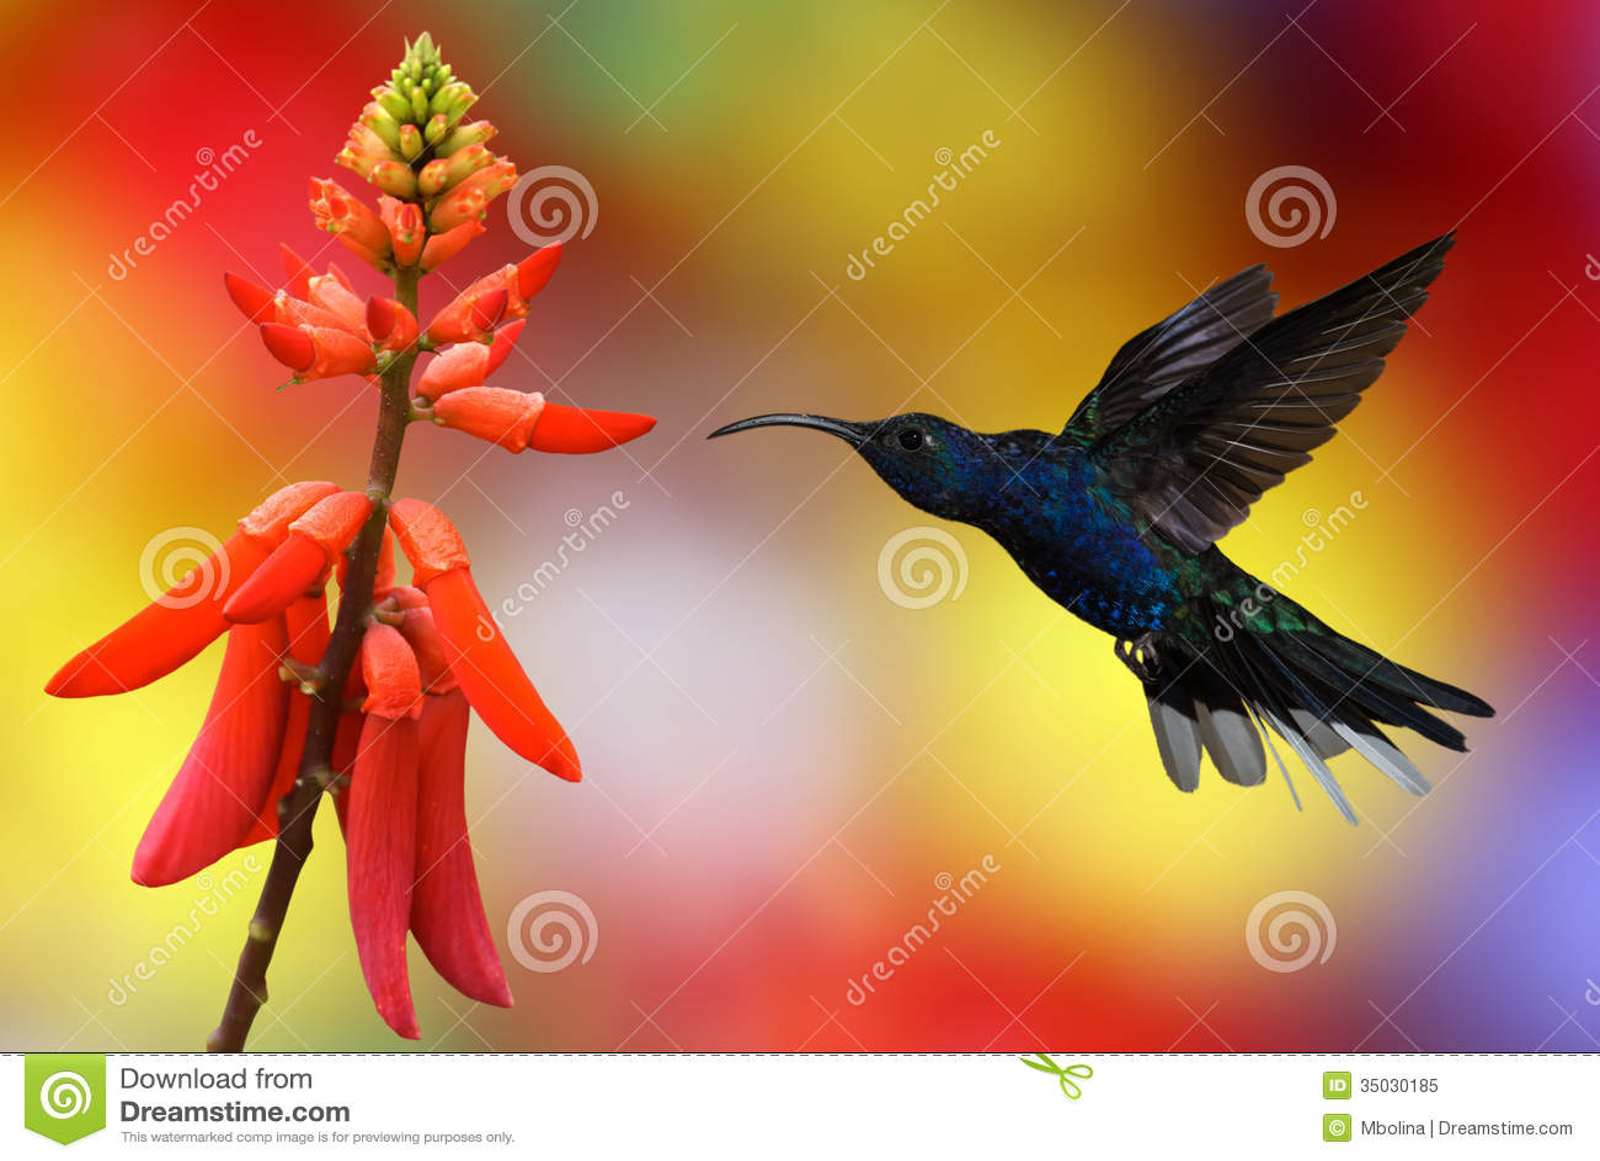 hummingbird stock photos images u0026 pictures 9 038 images